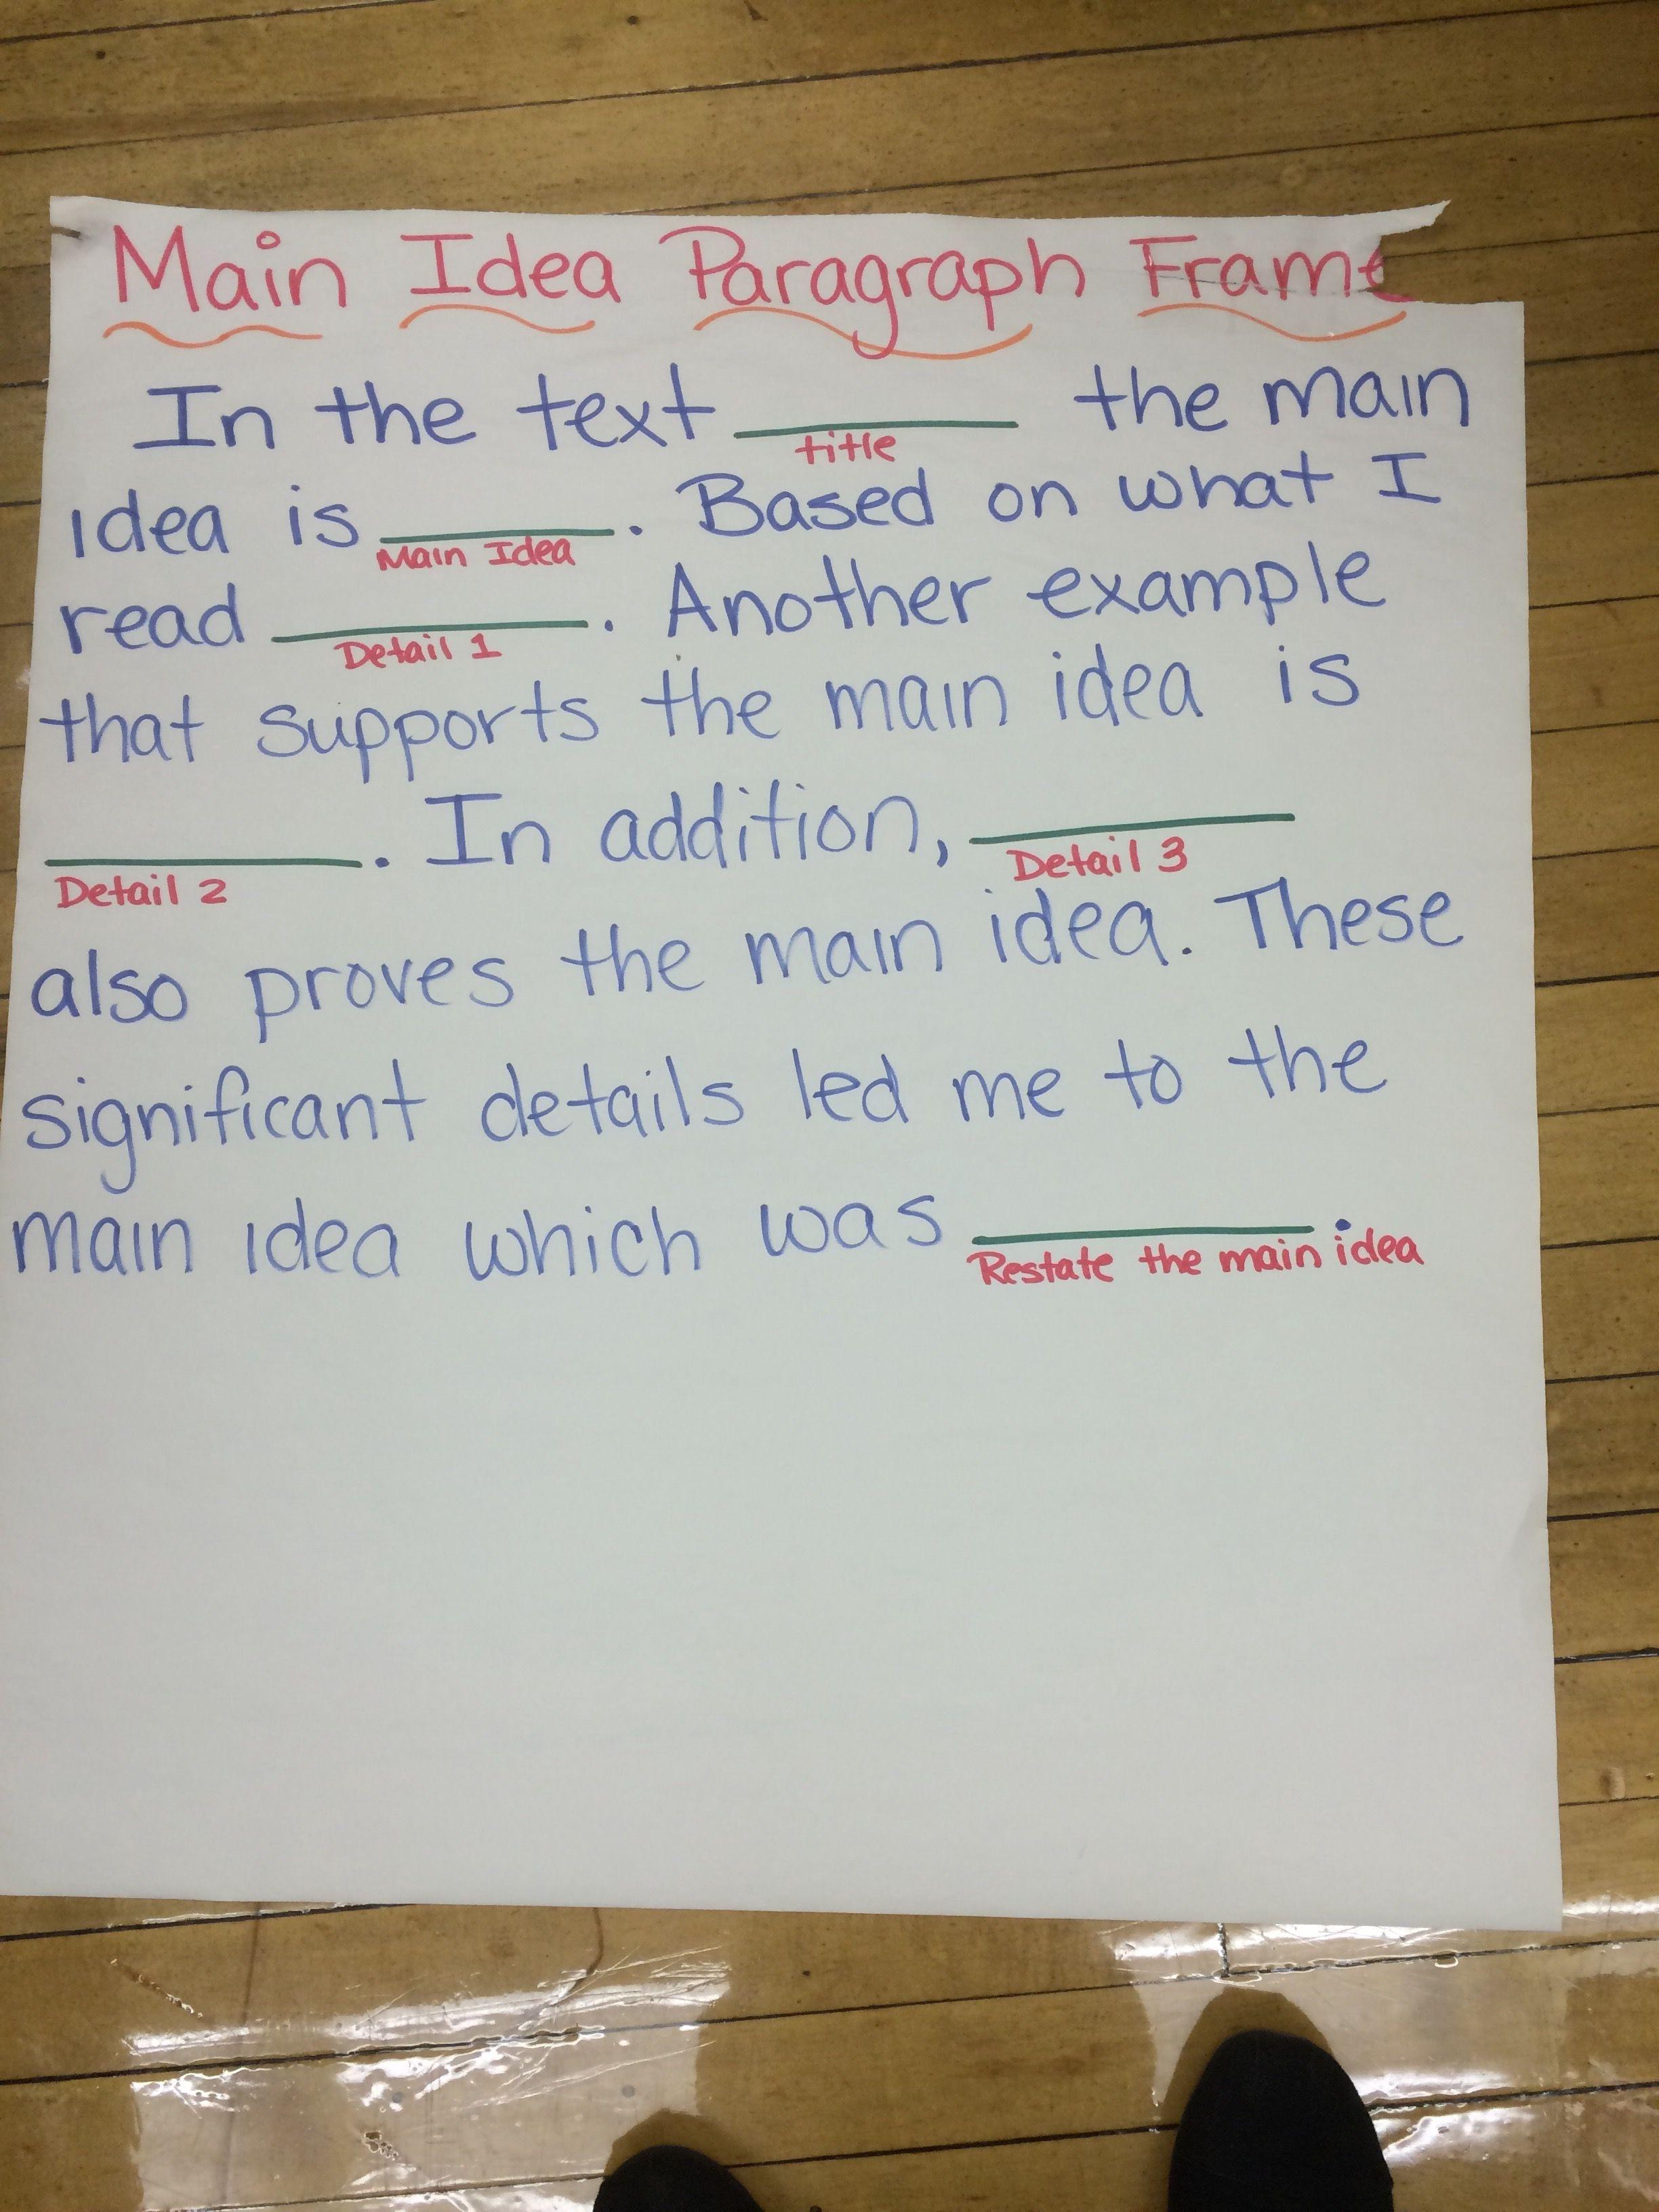 Main idea paragraph frame | ELL Sentence Frames | Pinterest ...